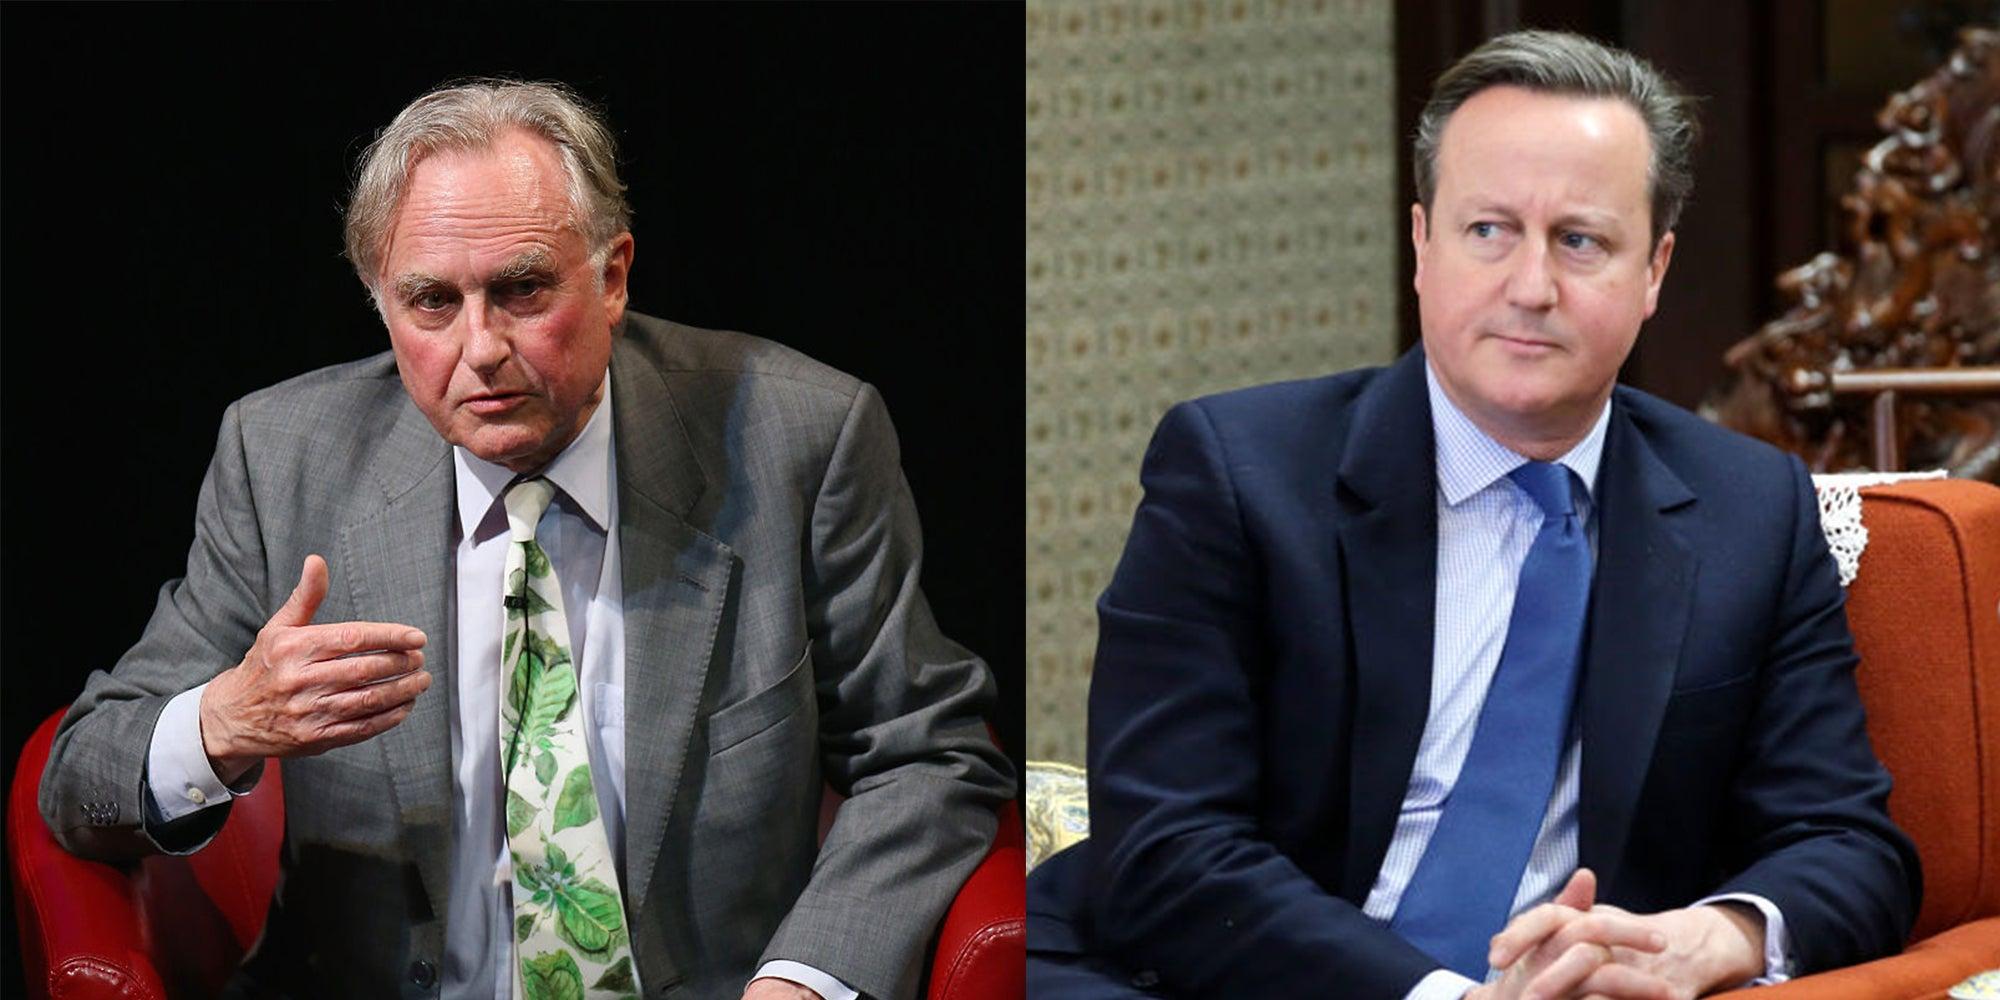 Richard Dawkins takes aim at David Cameron and the EU referendum